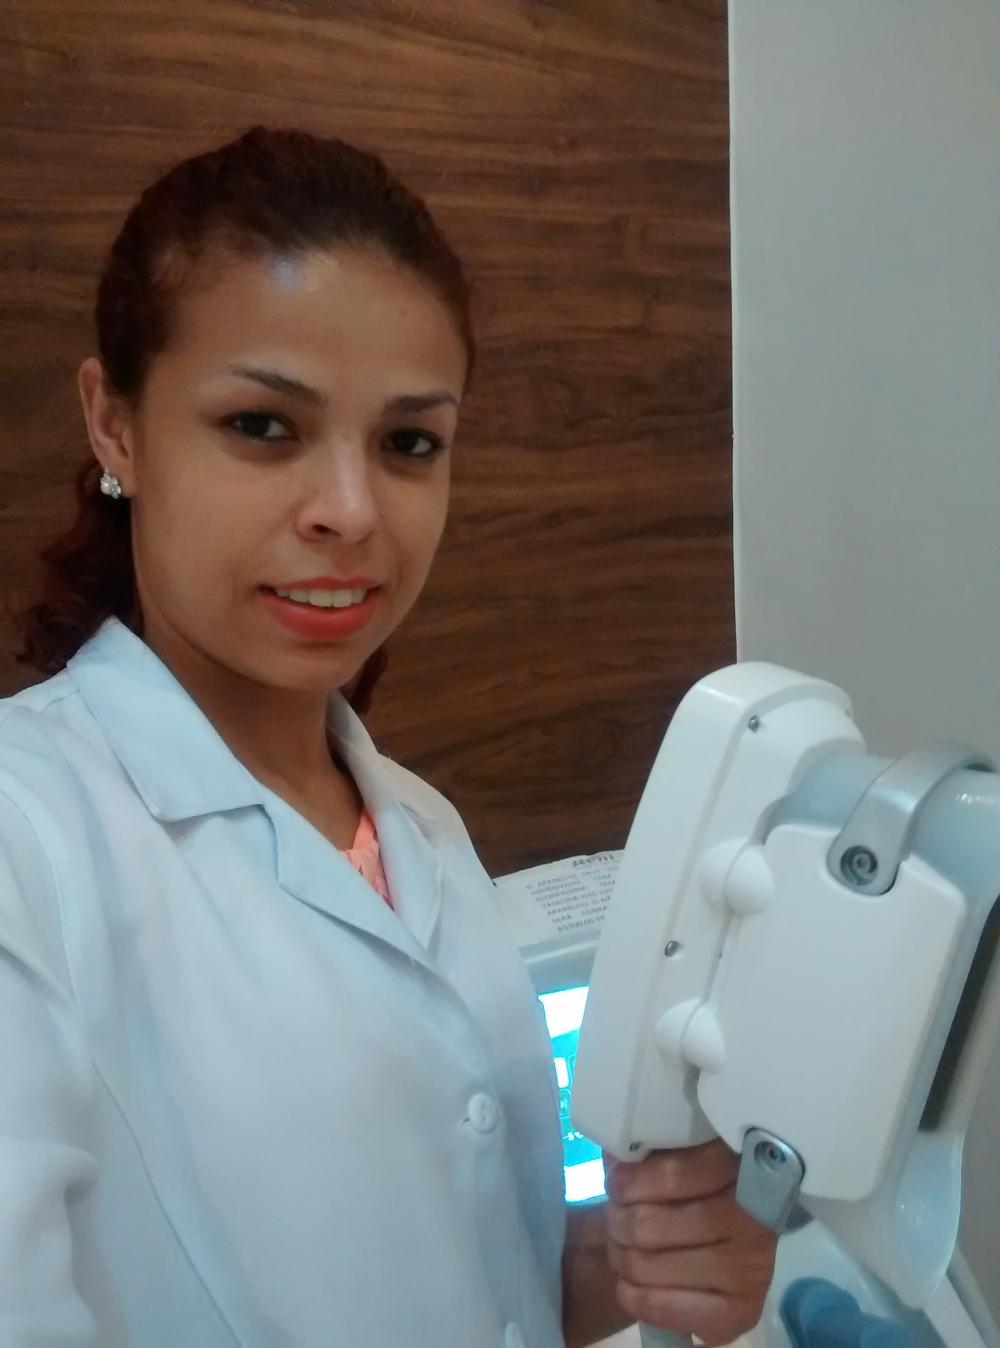 Onde Encontrar Tratamento Estético para Face na Vila Alice - Tratamentos Estéticos para o Rosto